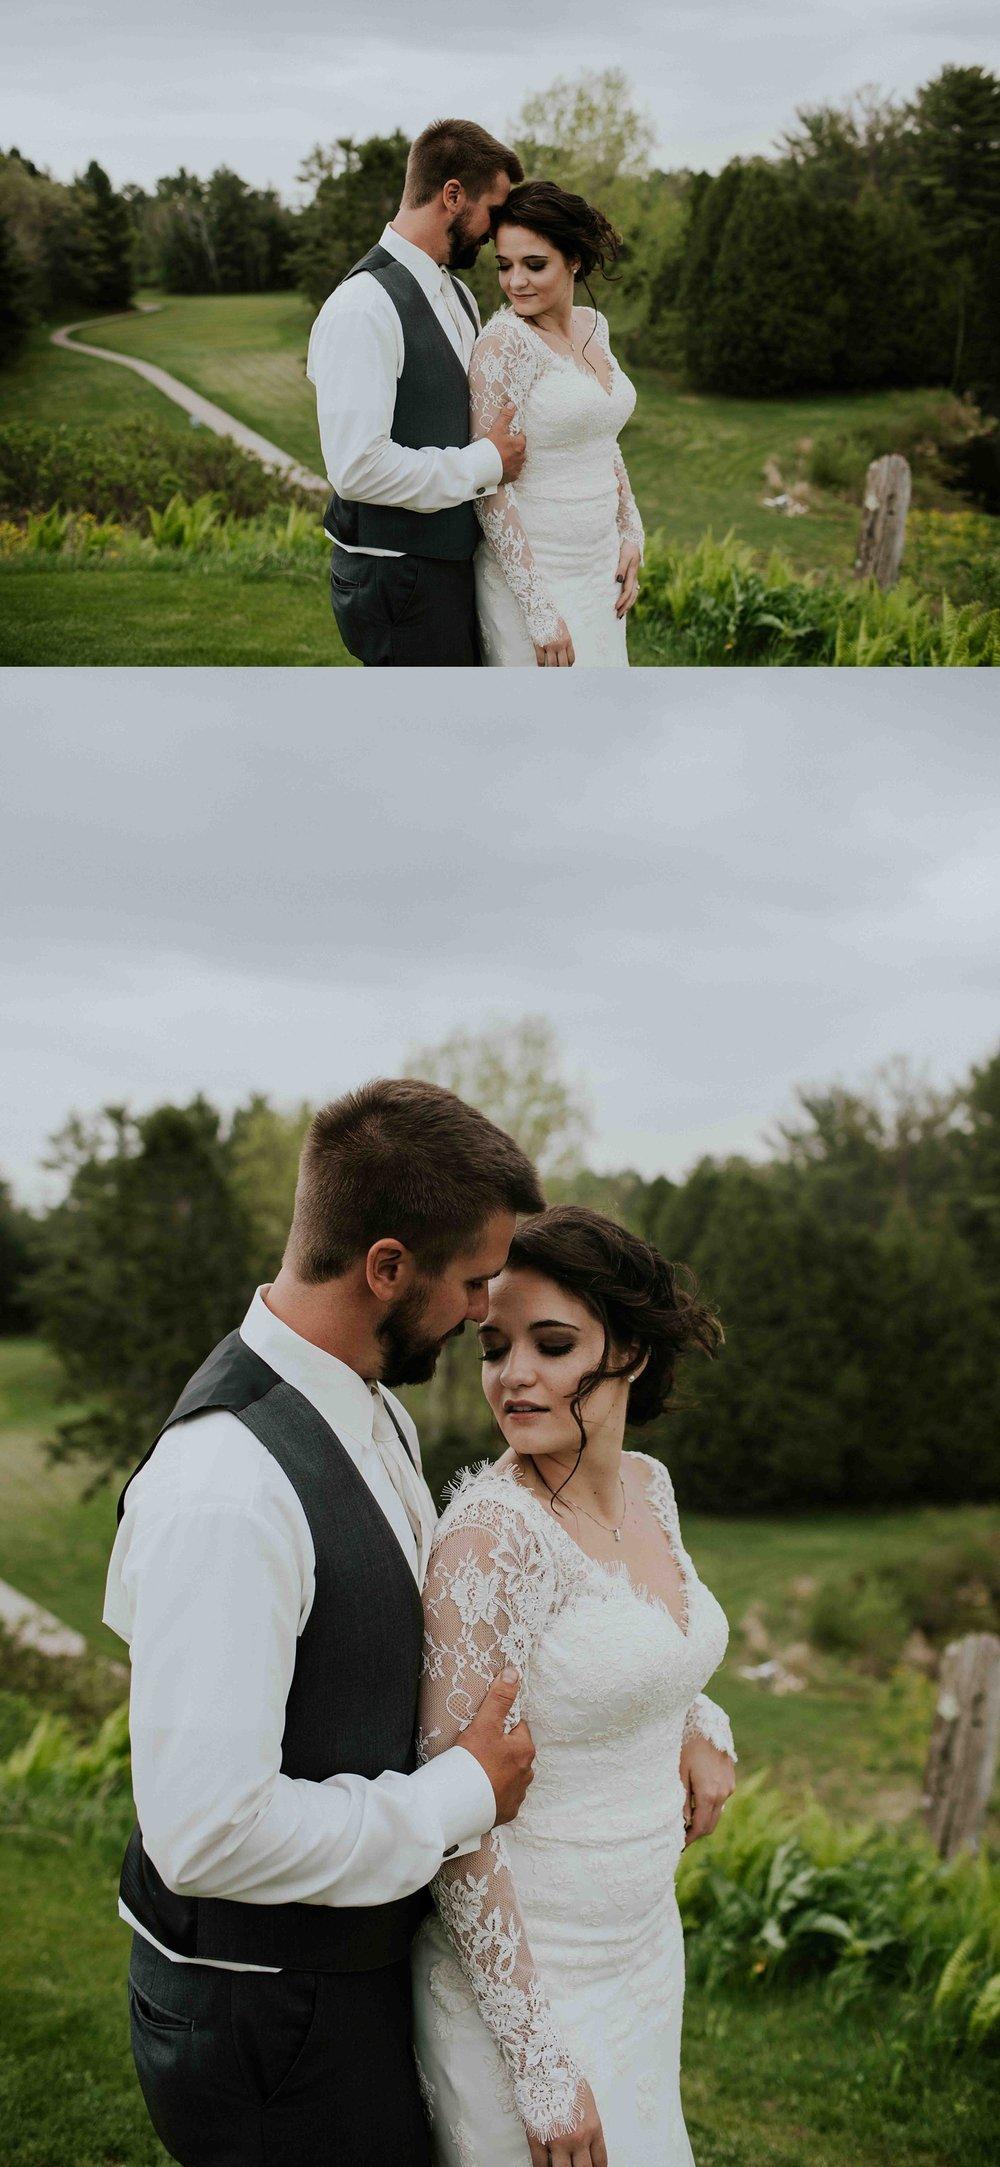 Ridges Golf Course Central Wisconsin Wedding Photographer Chloe Ann Photography_0024.jpg